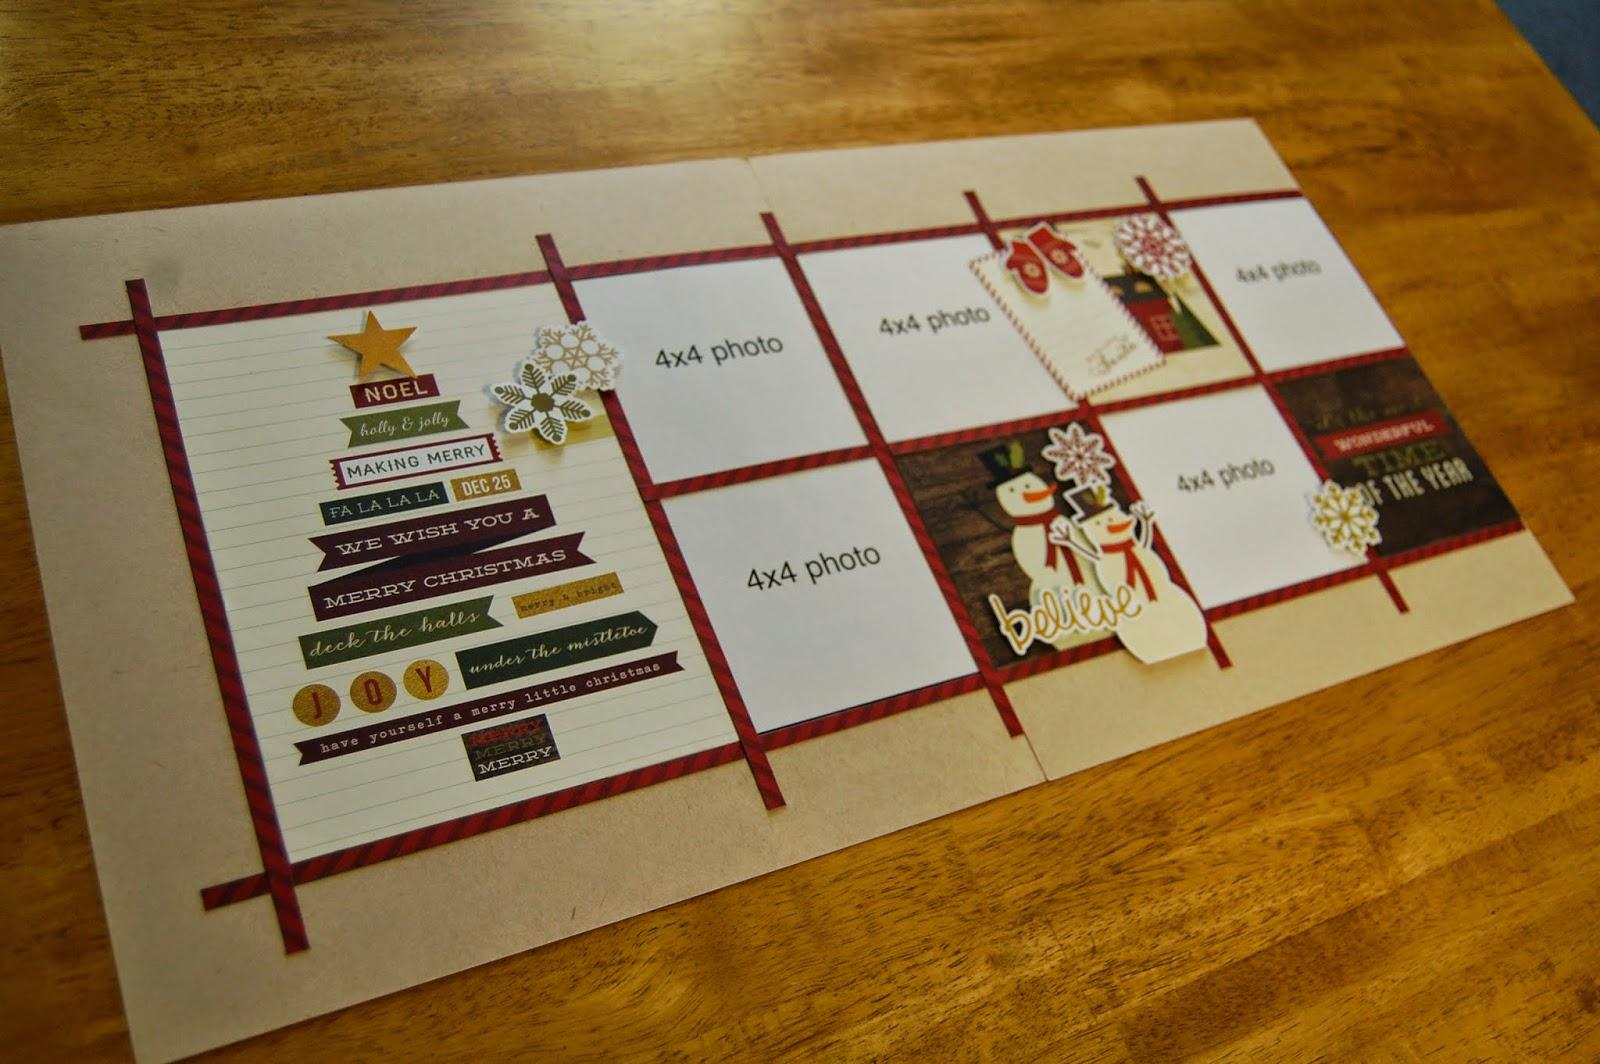 Scrapbook generation super sketch club photos for Christmas layout ideas